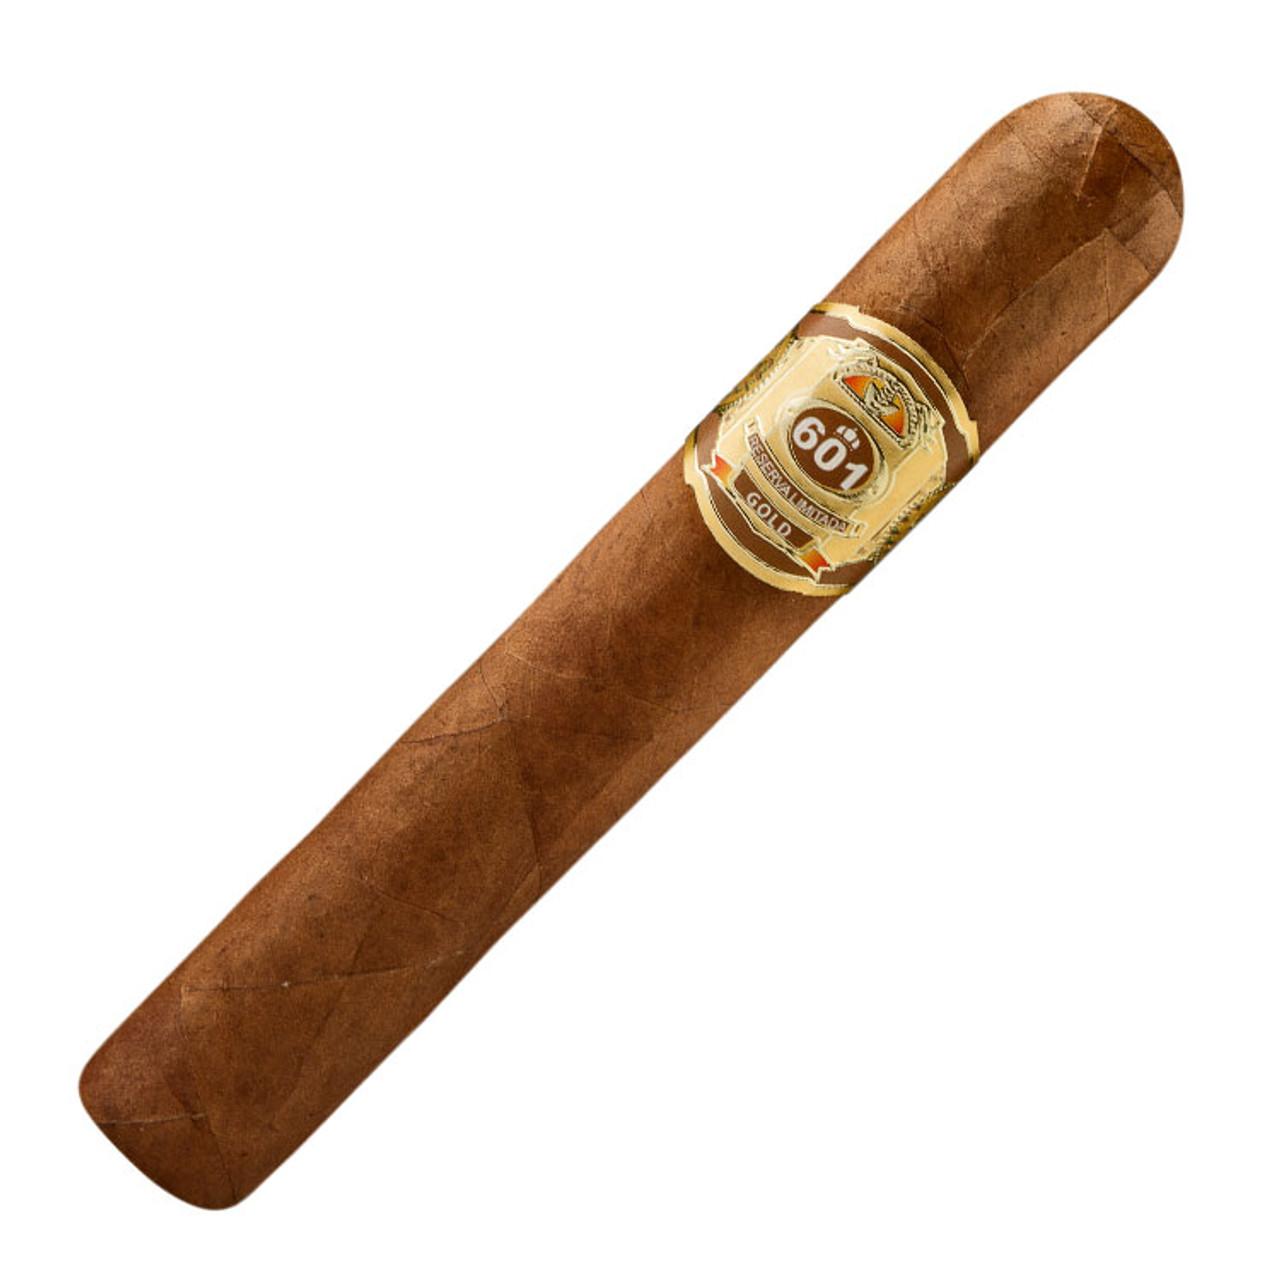 601 Gold Label Gordo Cigar